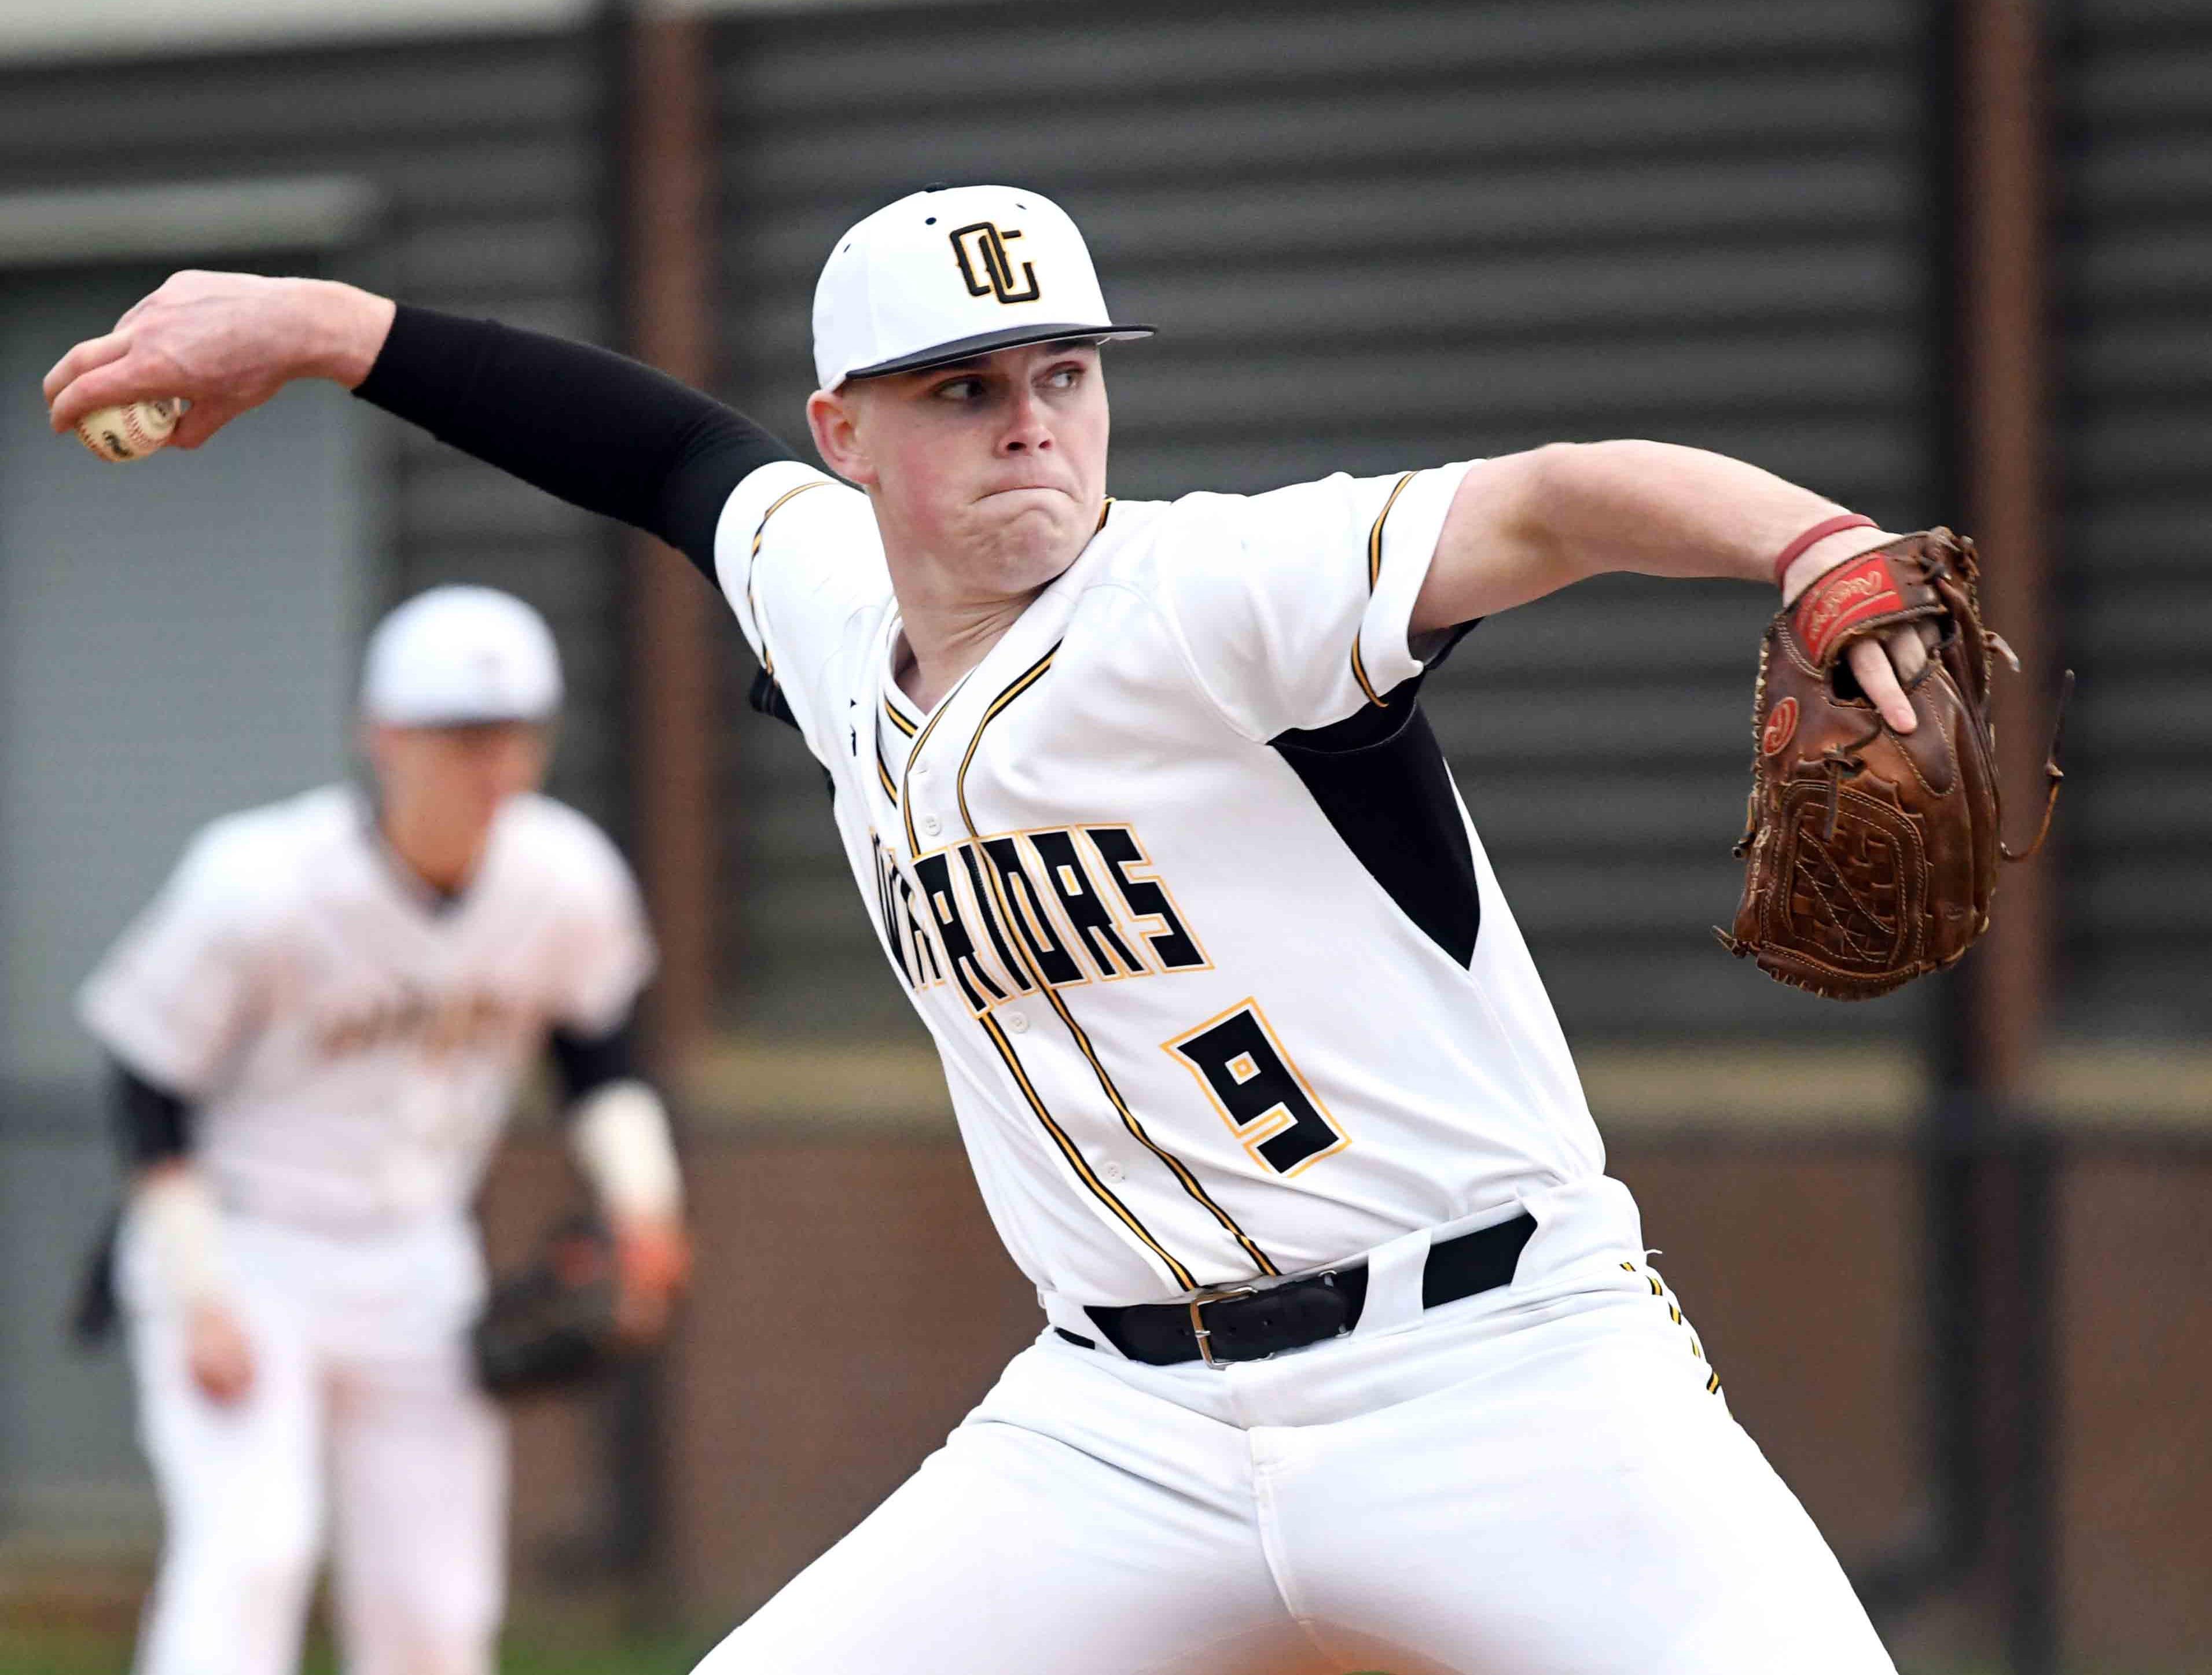 Oak Grove junior Luke Lyon pitches in their season opener against Seminary in Hattiesburg on Monday, February 18, 2019.